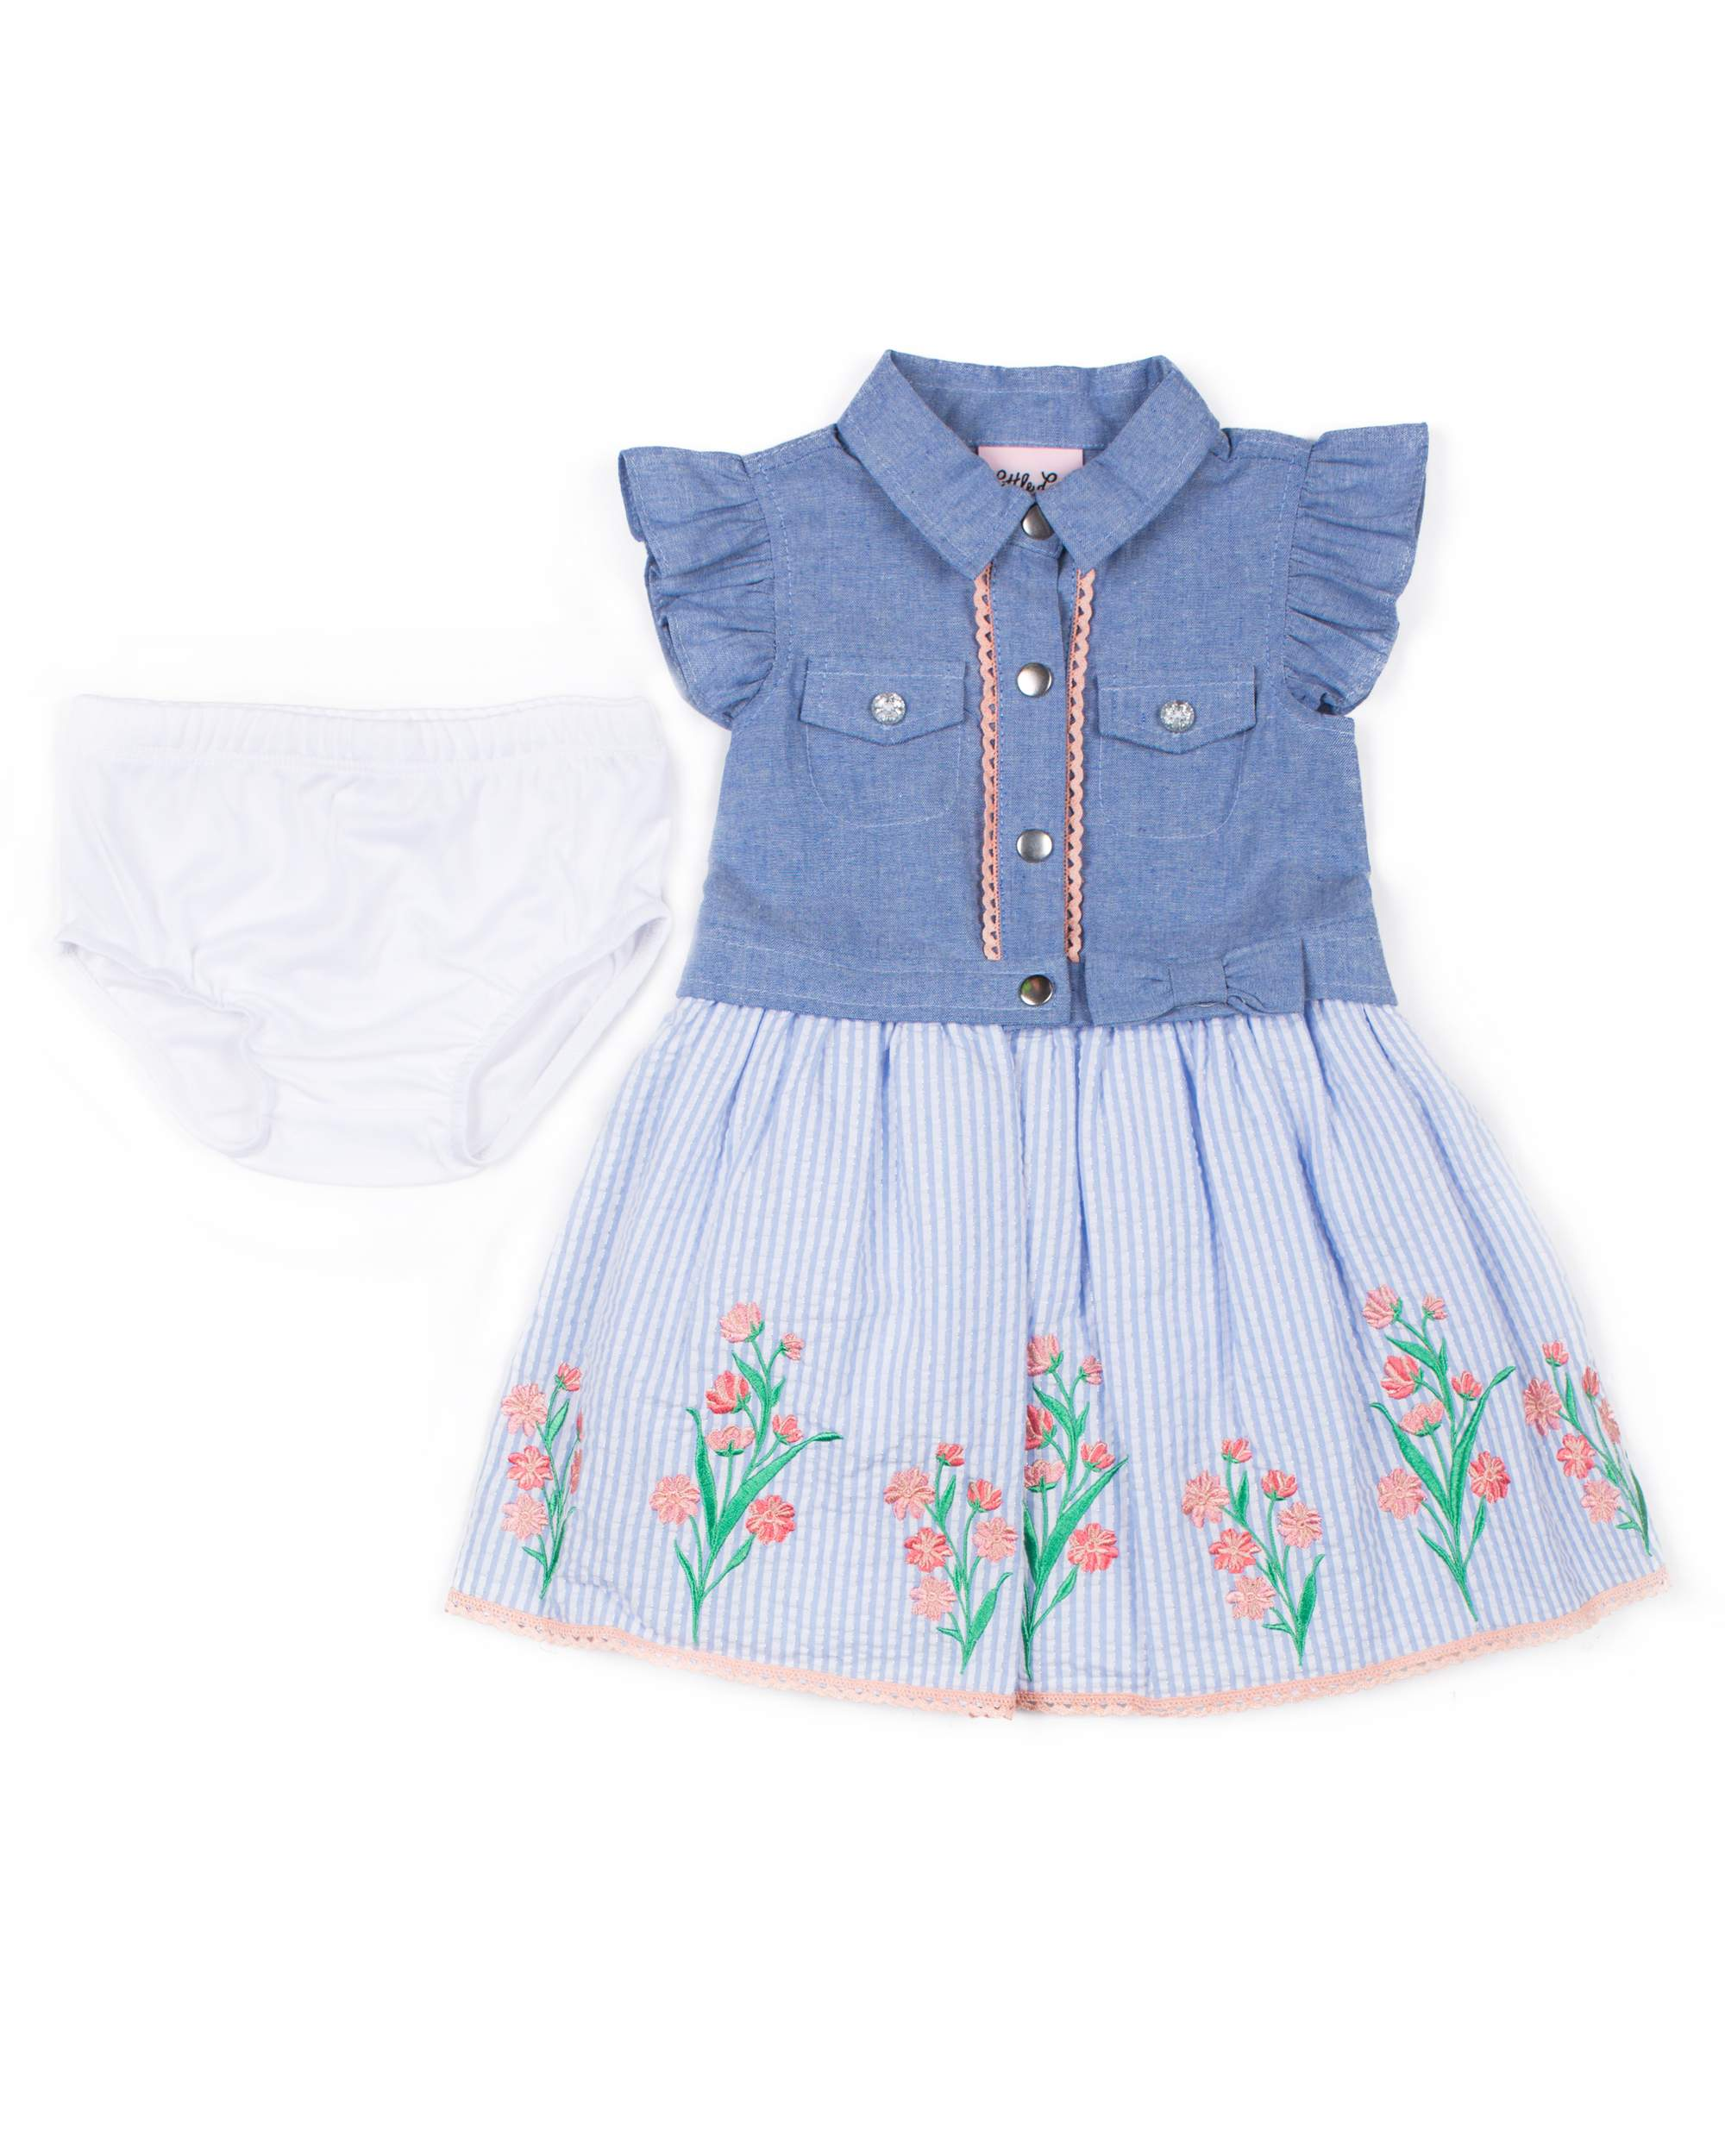 Short Sleeve Chambray & Seersucker Puff Print Dress (Baby Girls & Toddler Girls)